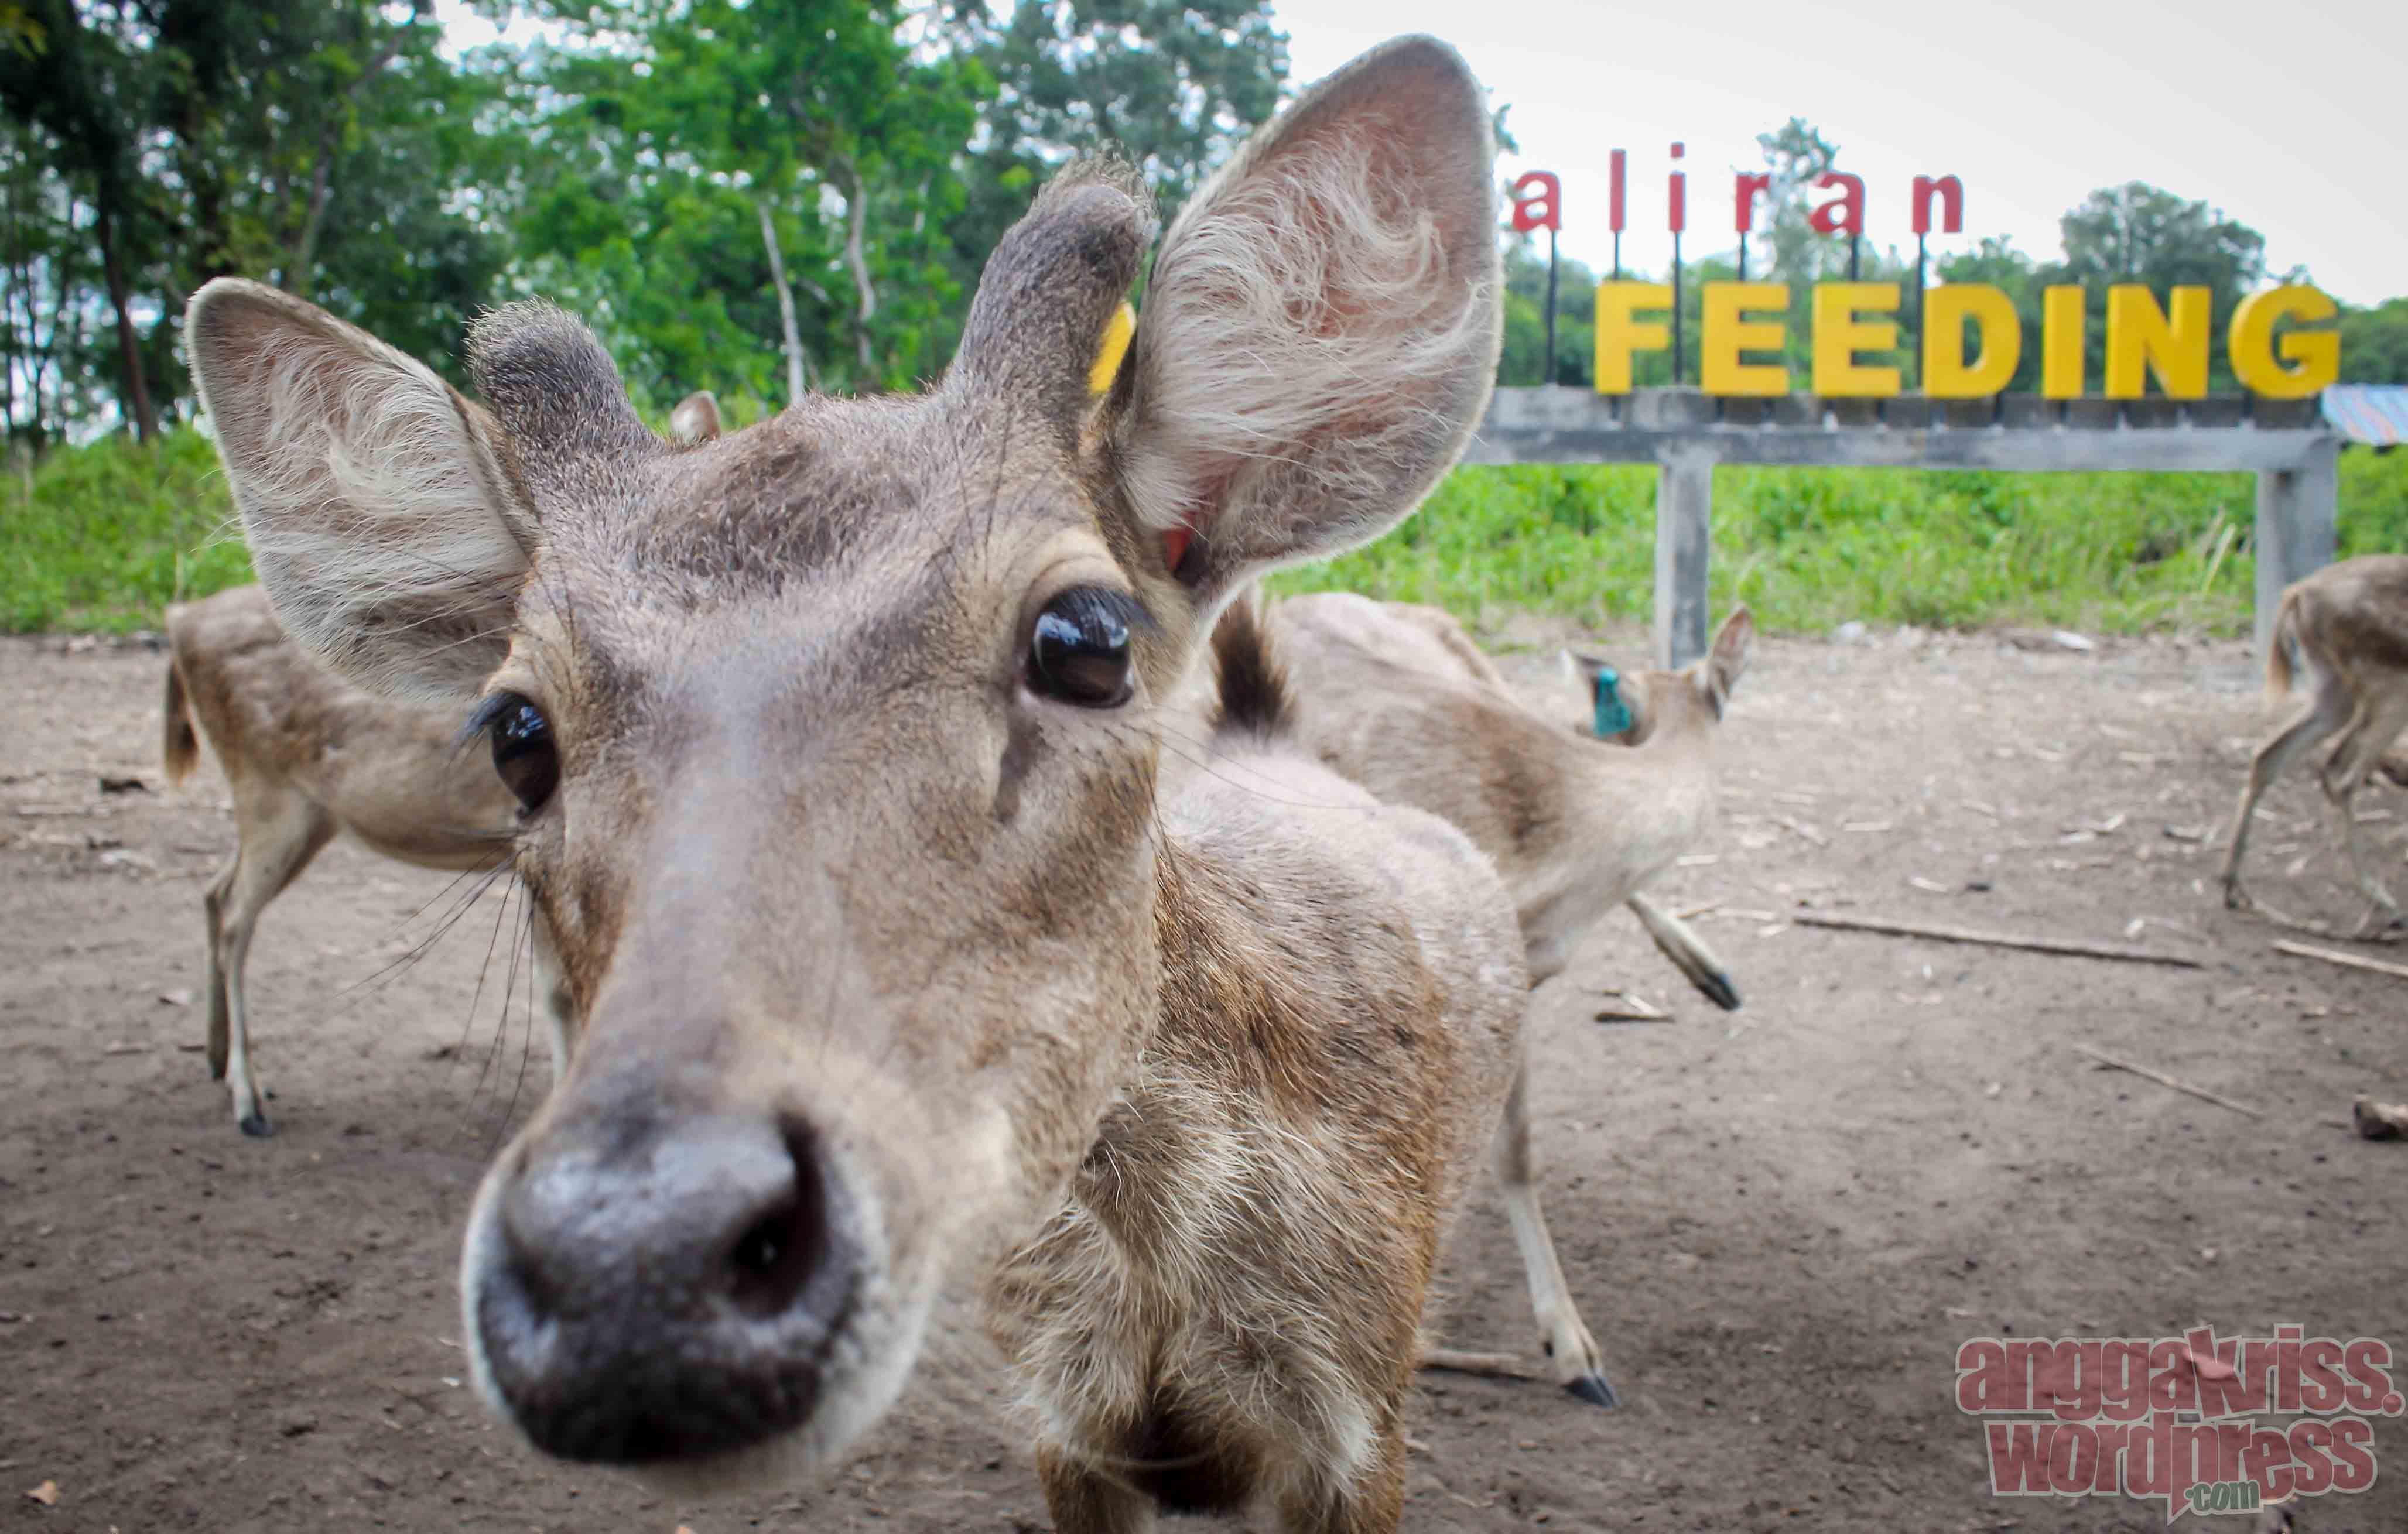 Memanjakan Rusa Maliran Deer Feeding Blitar Anggakris Blog Enak Enaknya